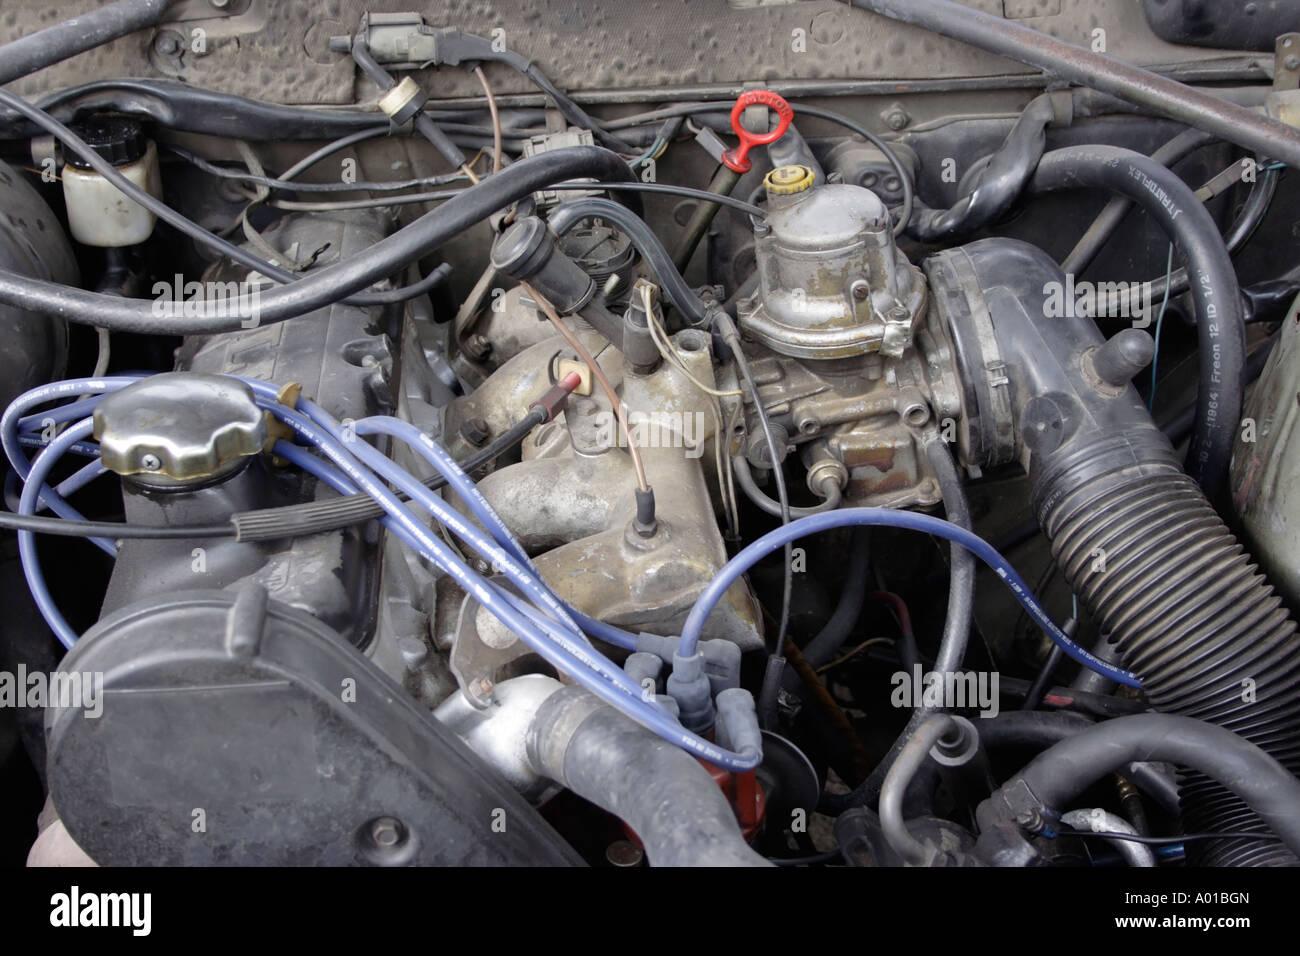 Engine Motor Carburettor Car Engine Stockfotos & Engine Motor ...